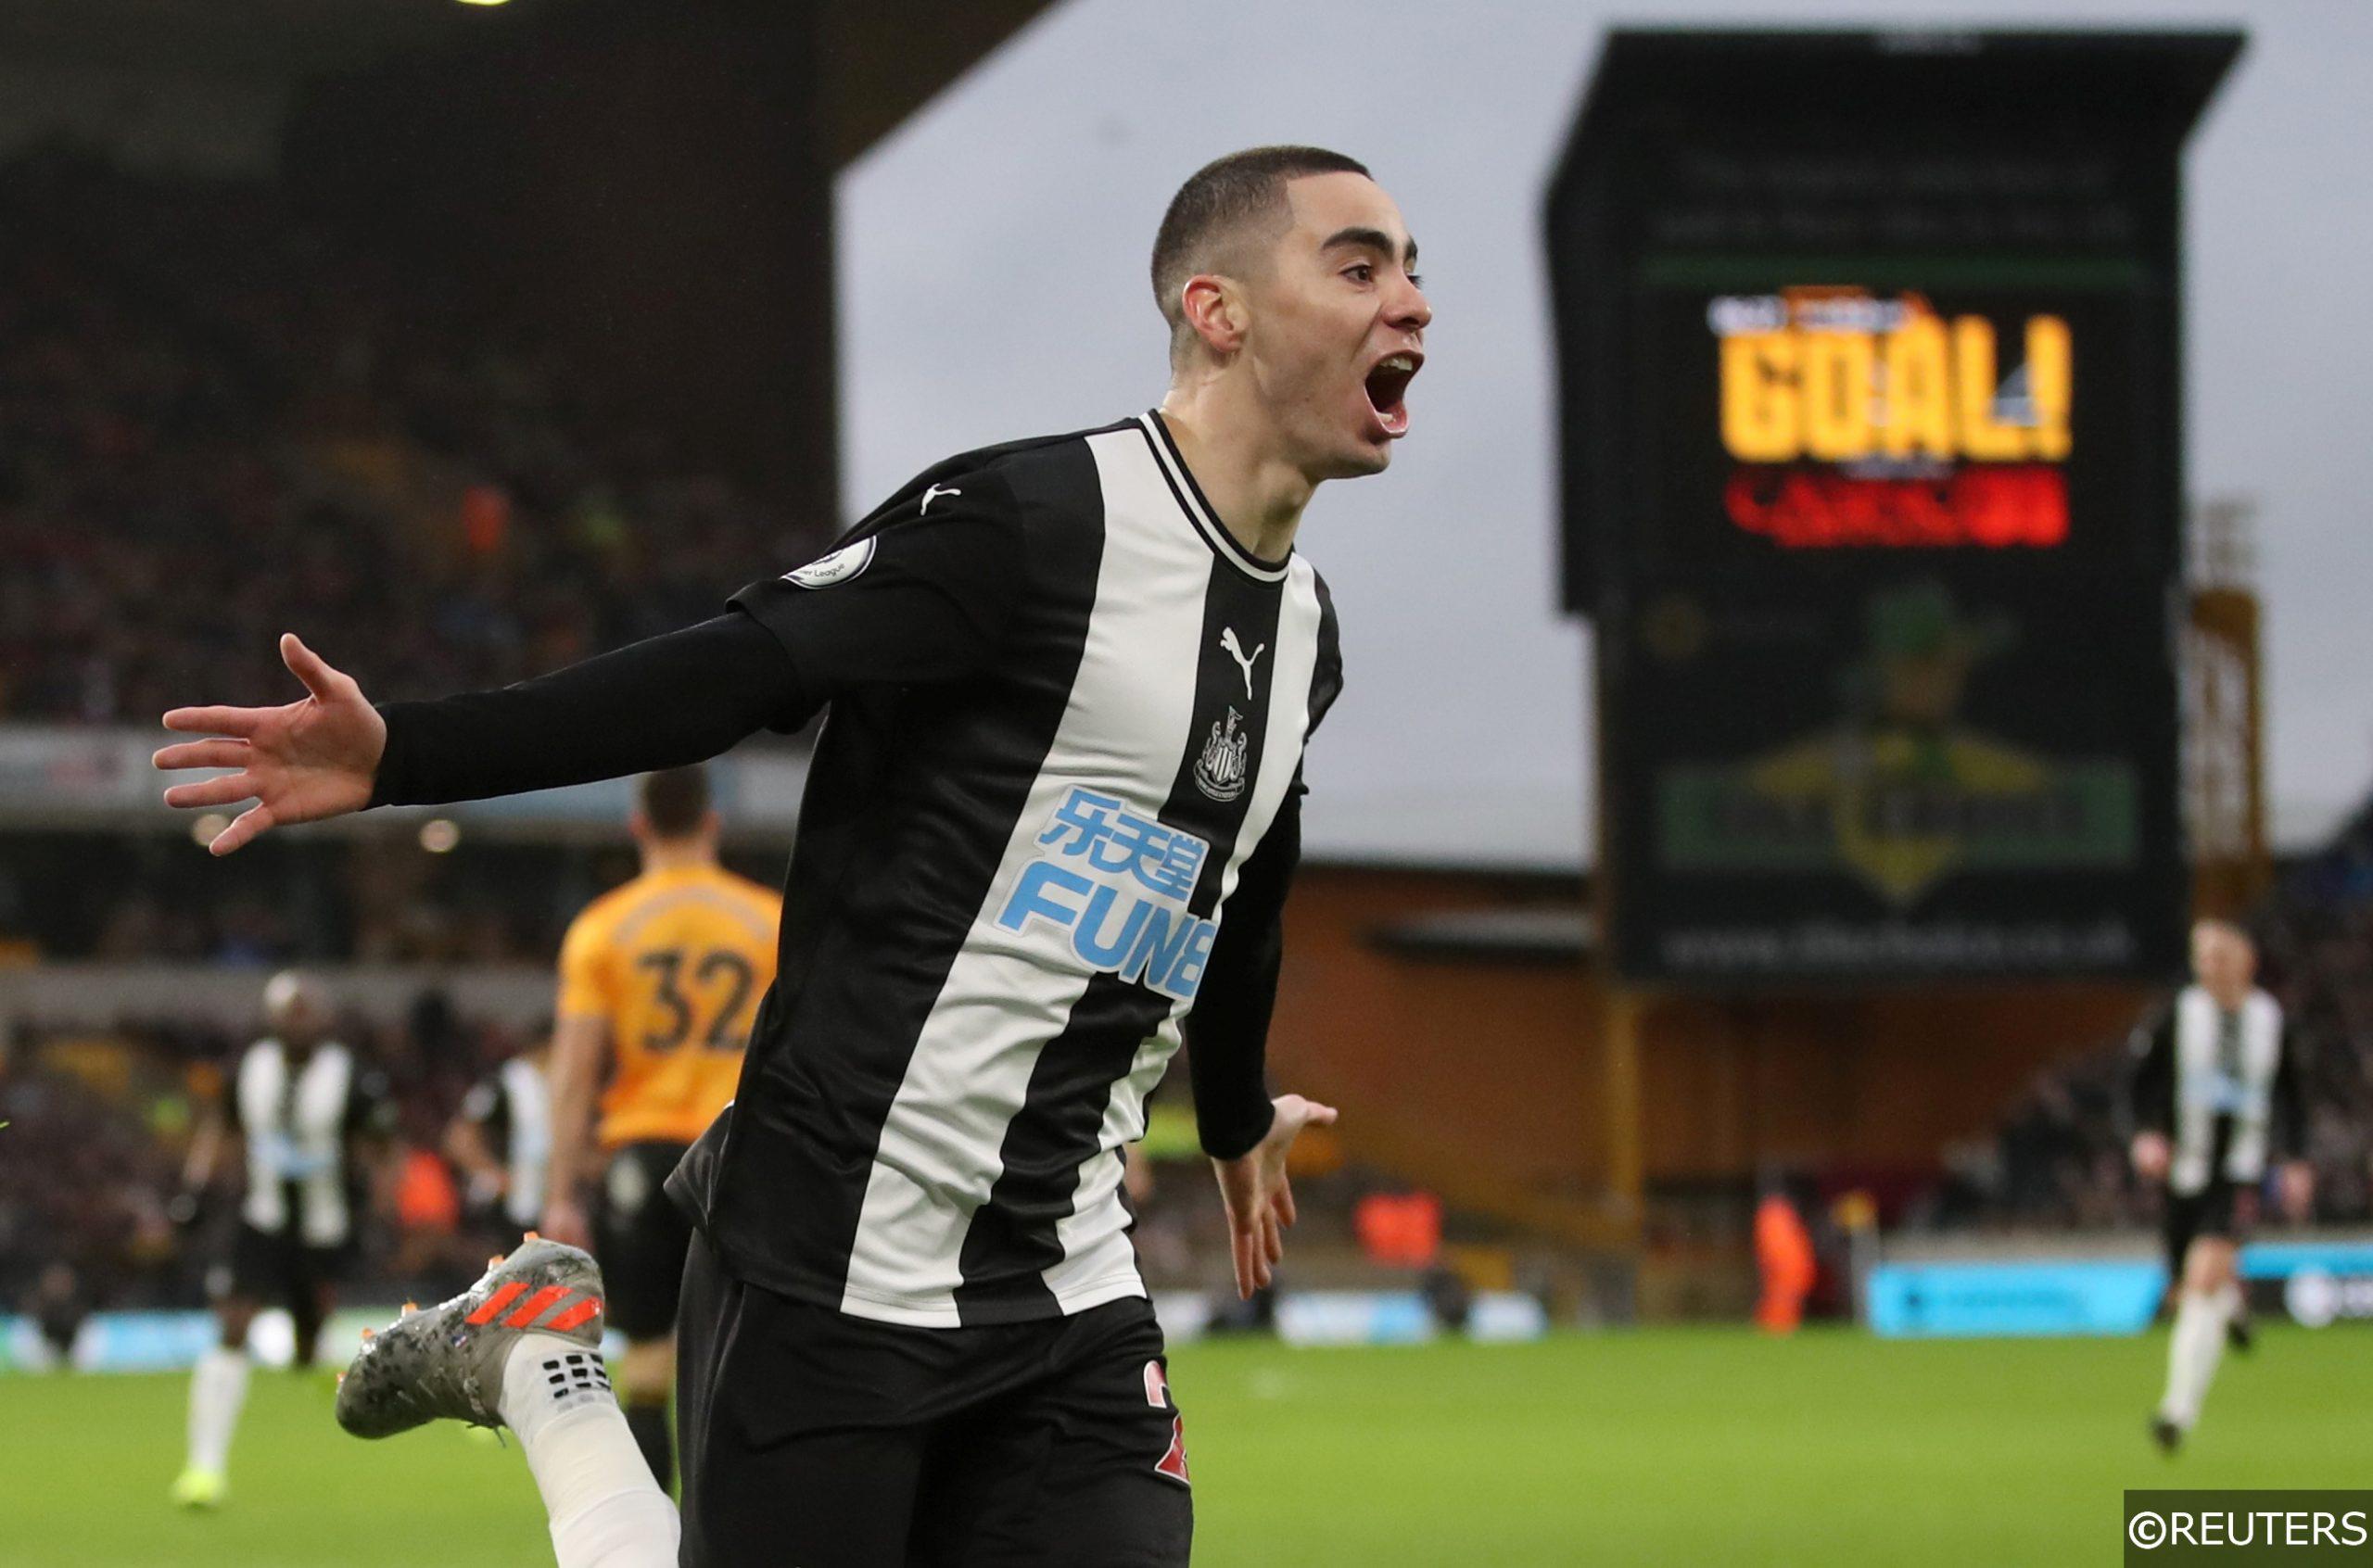 Newcastle United's Miguel Almiron celebrates